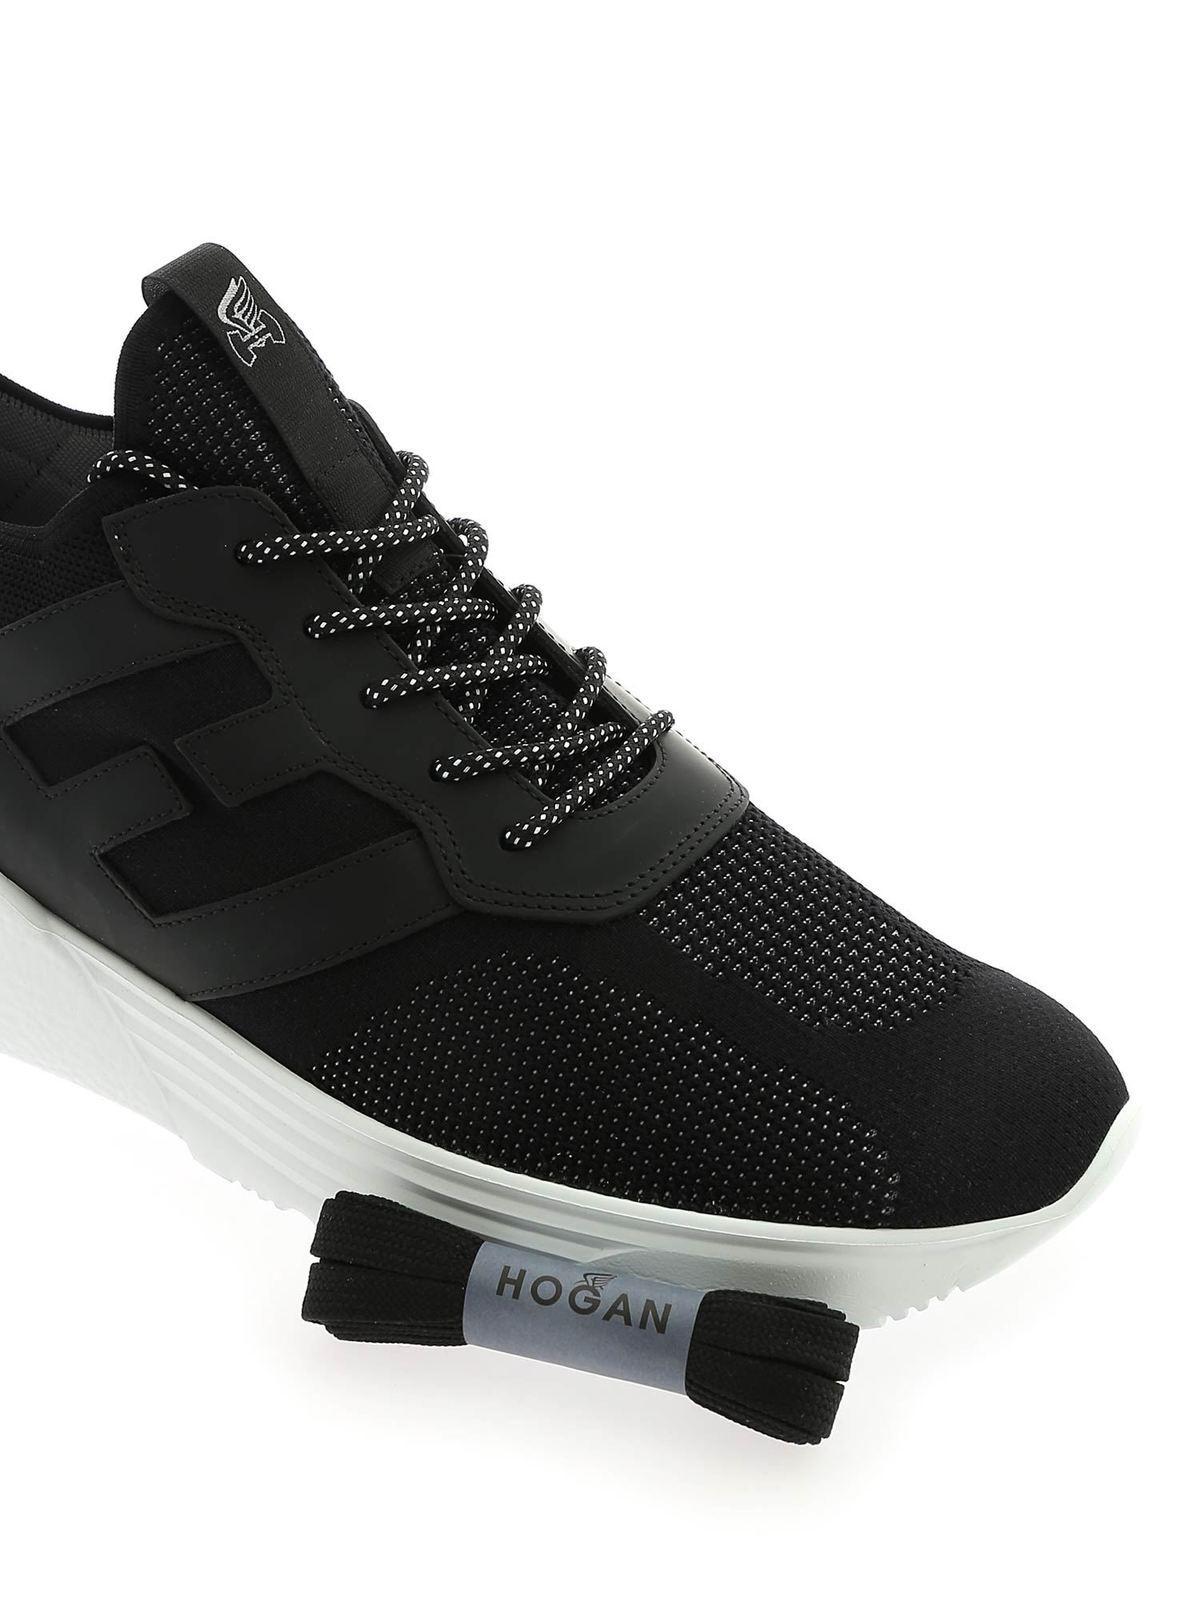 Hogan H443 Sneakers In Black for Men - Lyst